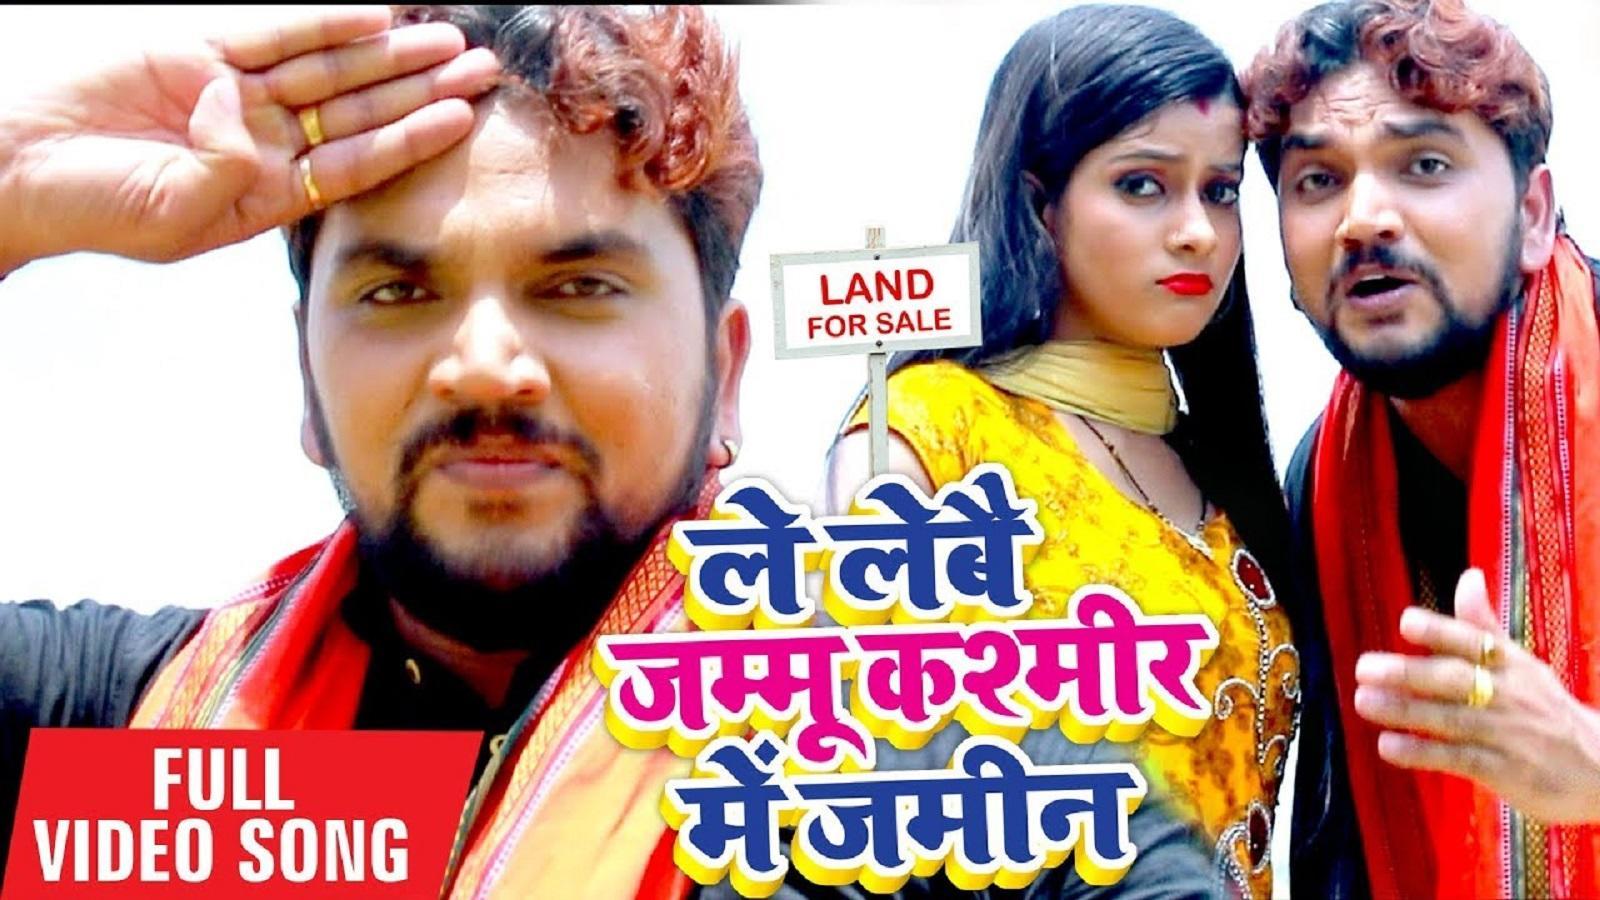 Naya Bhojpuri Gana Video Song: Latest Bhojpuri song 'Le Laibe Jammu Kashmir  Me Jamin' sung by Gunjan Singh and Anjali Bharti